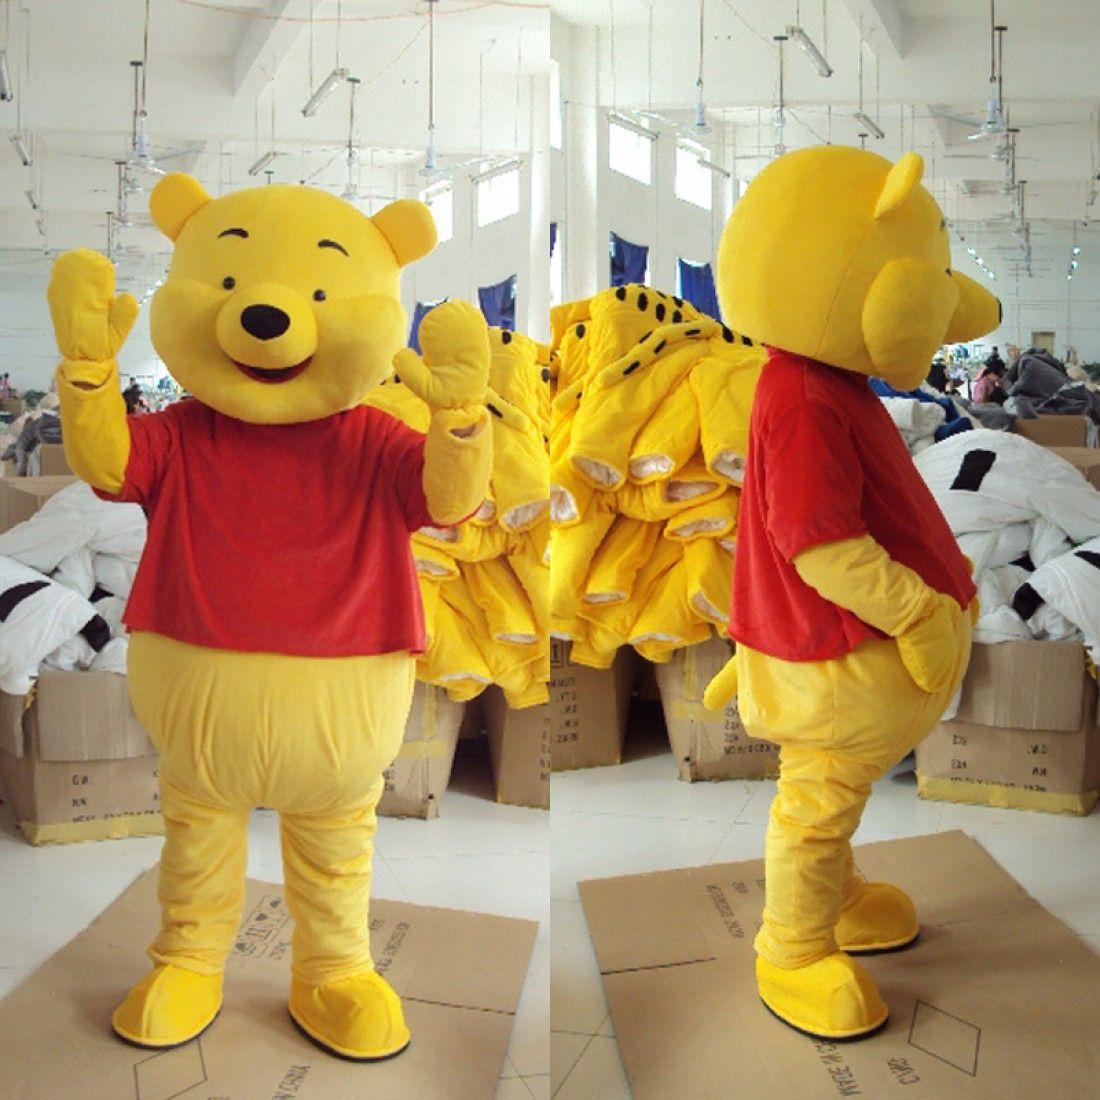 Bear costume mascot costumes cosplay holloween mascot